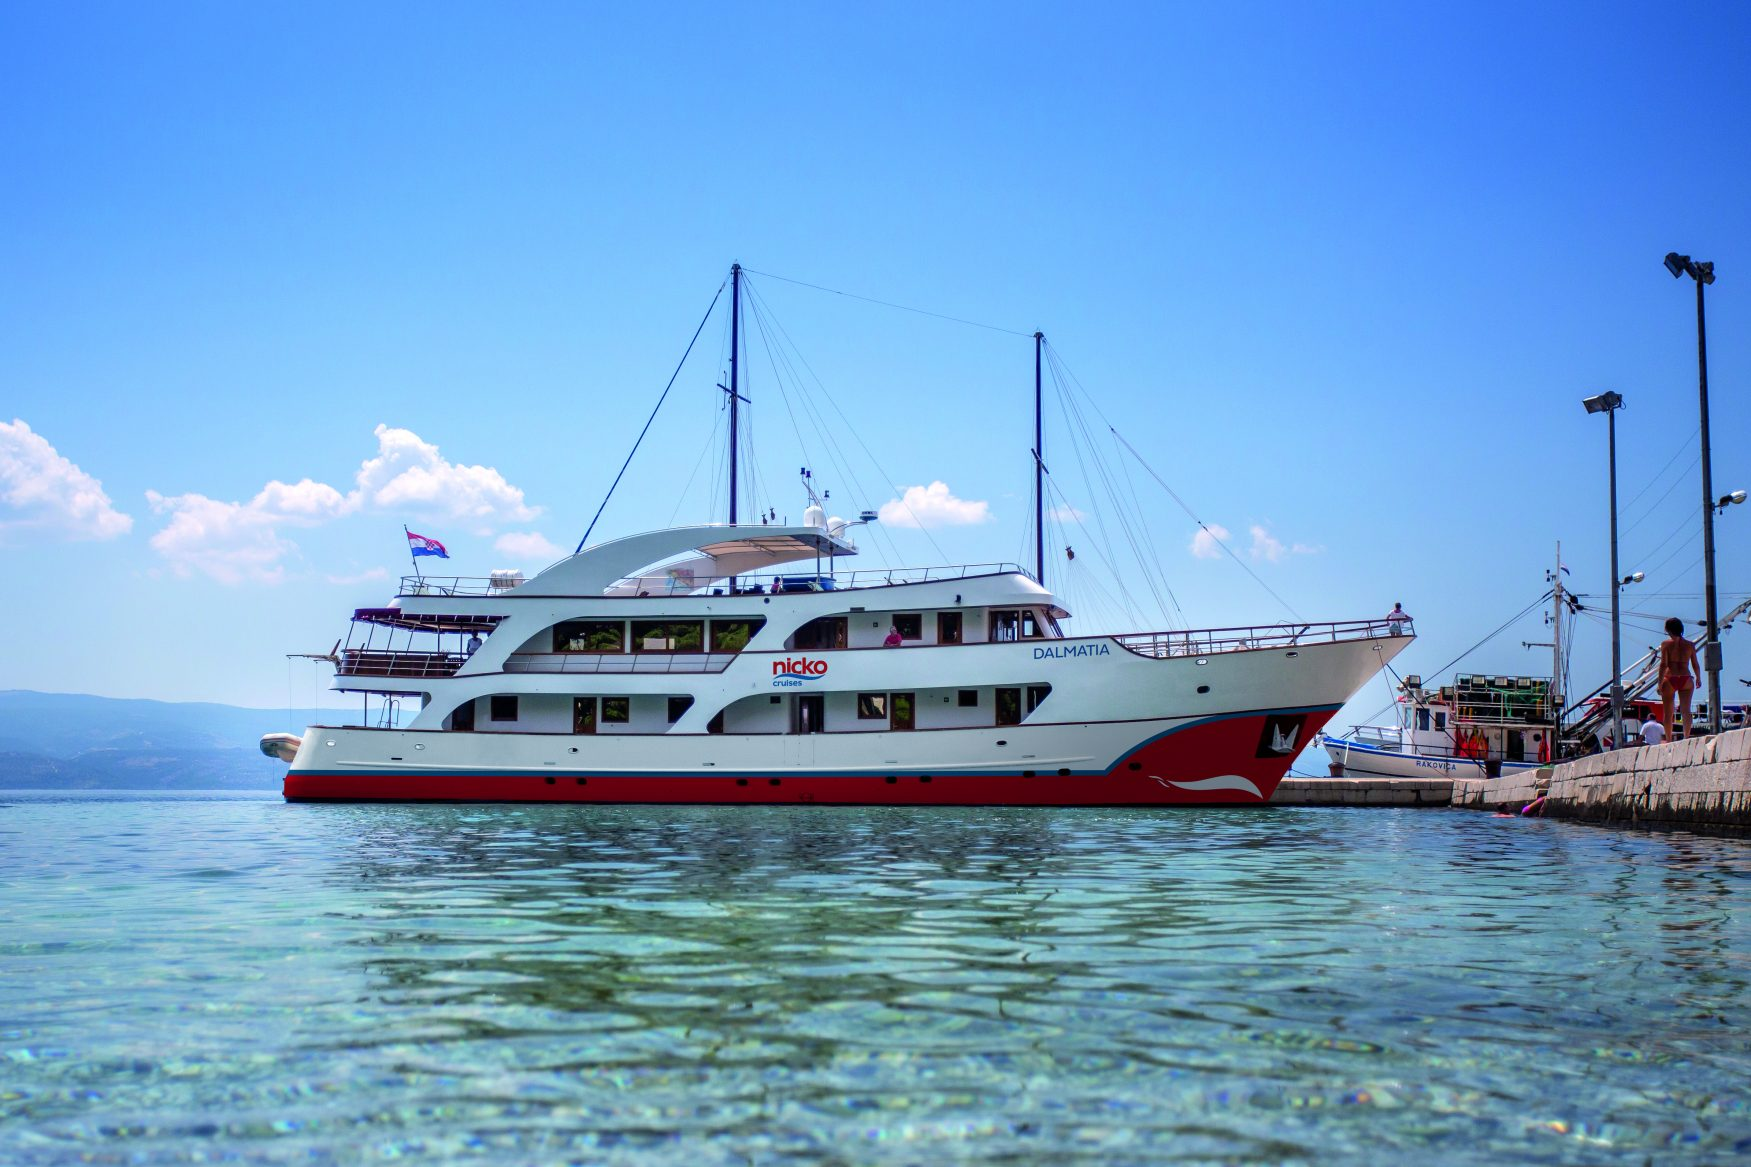 1_MS_DALMATIA_2018 Foto: nicko cruises